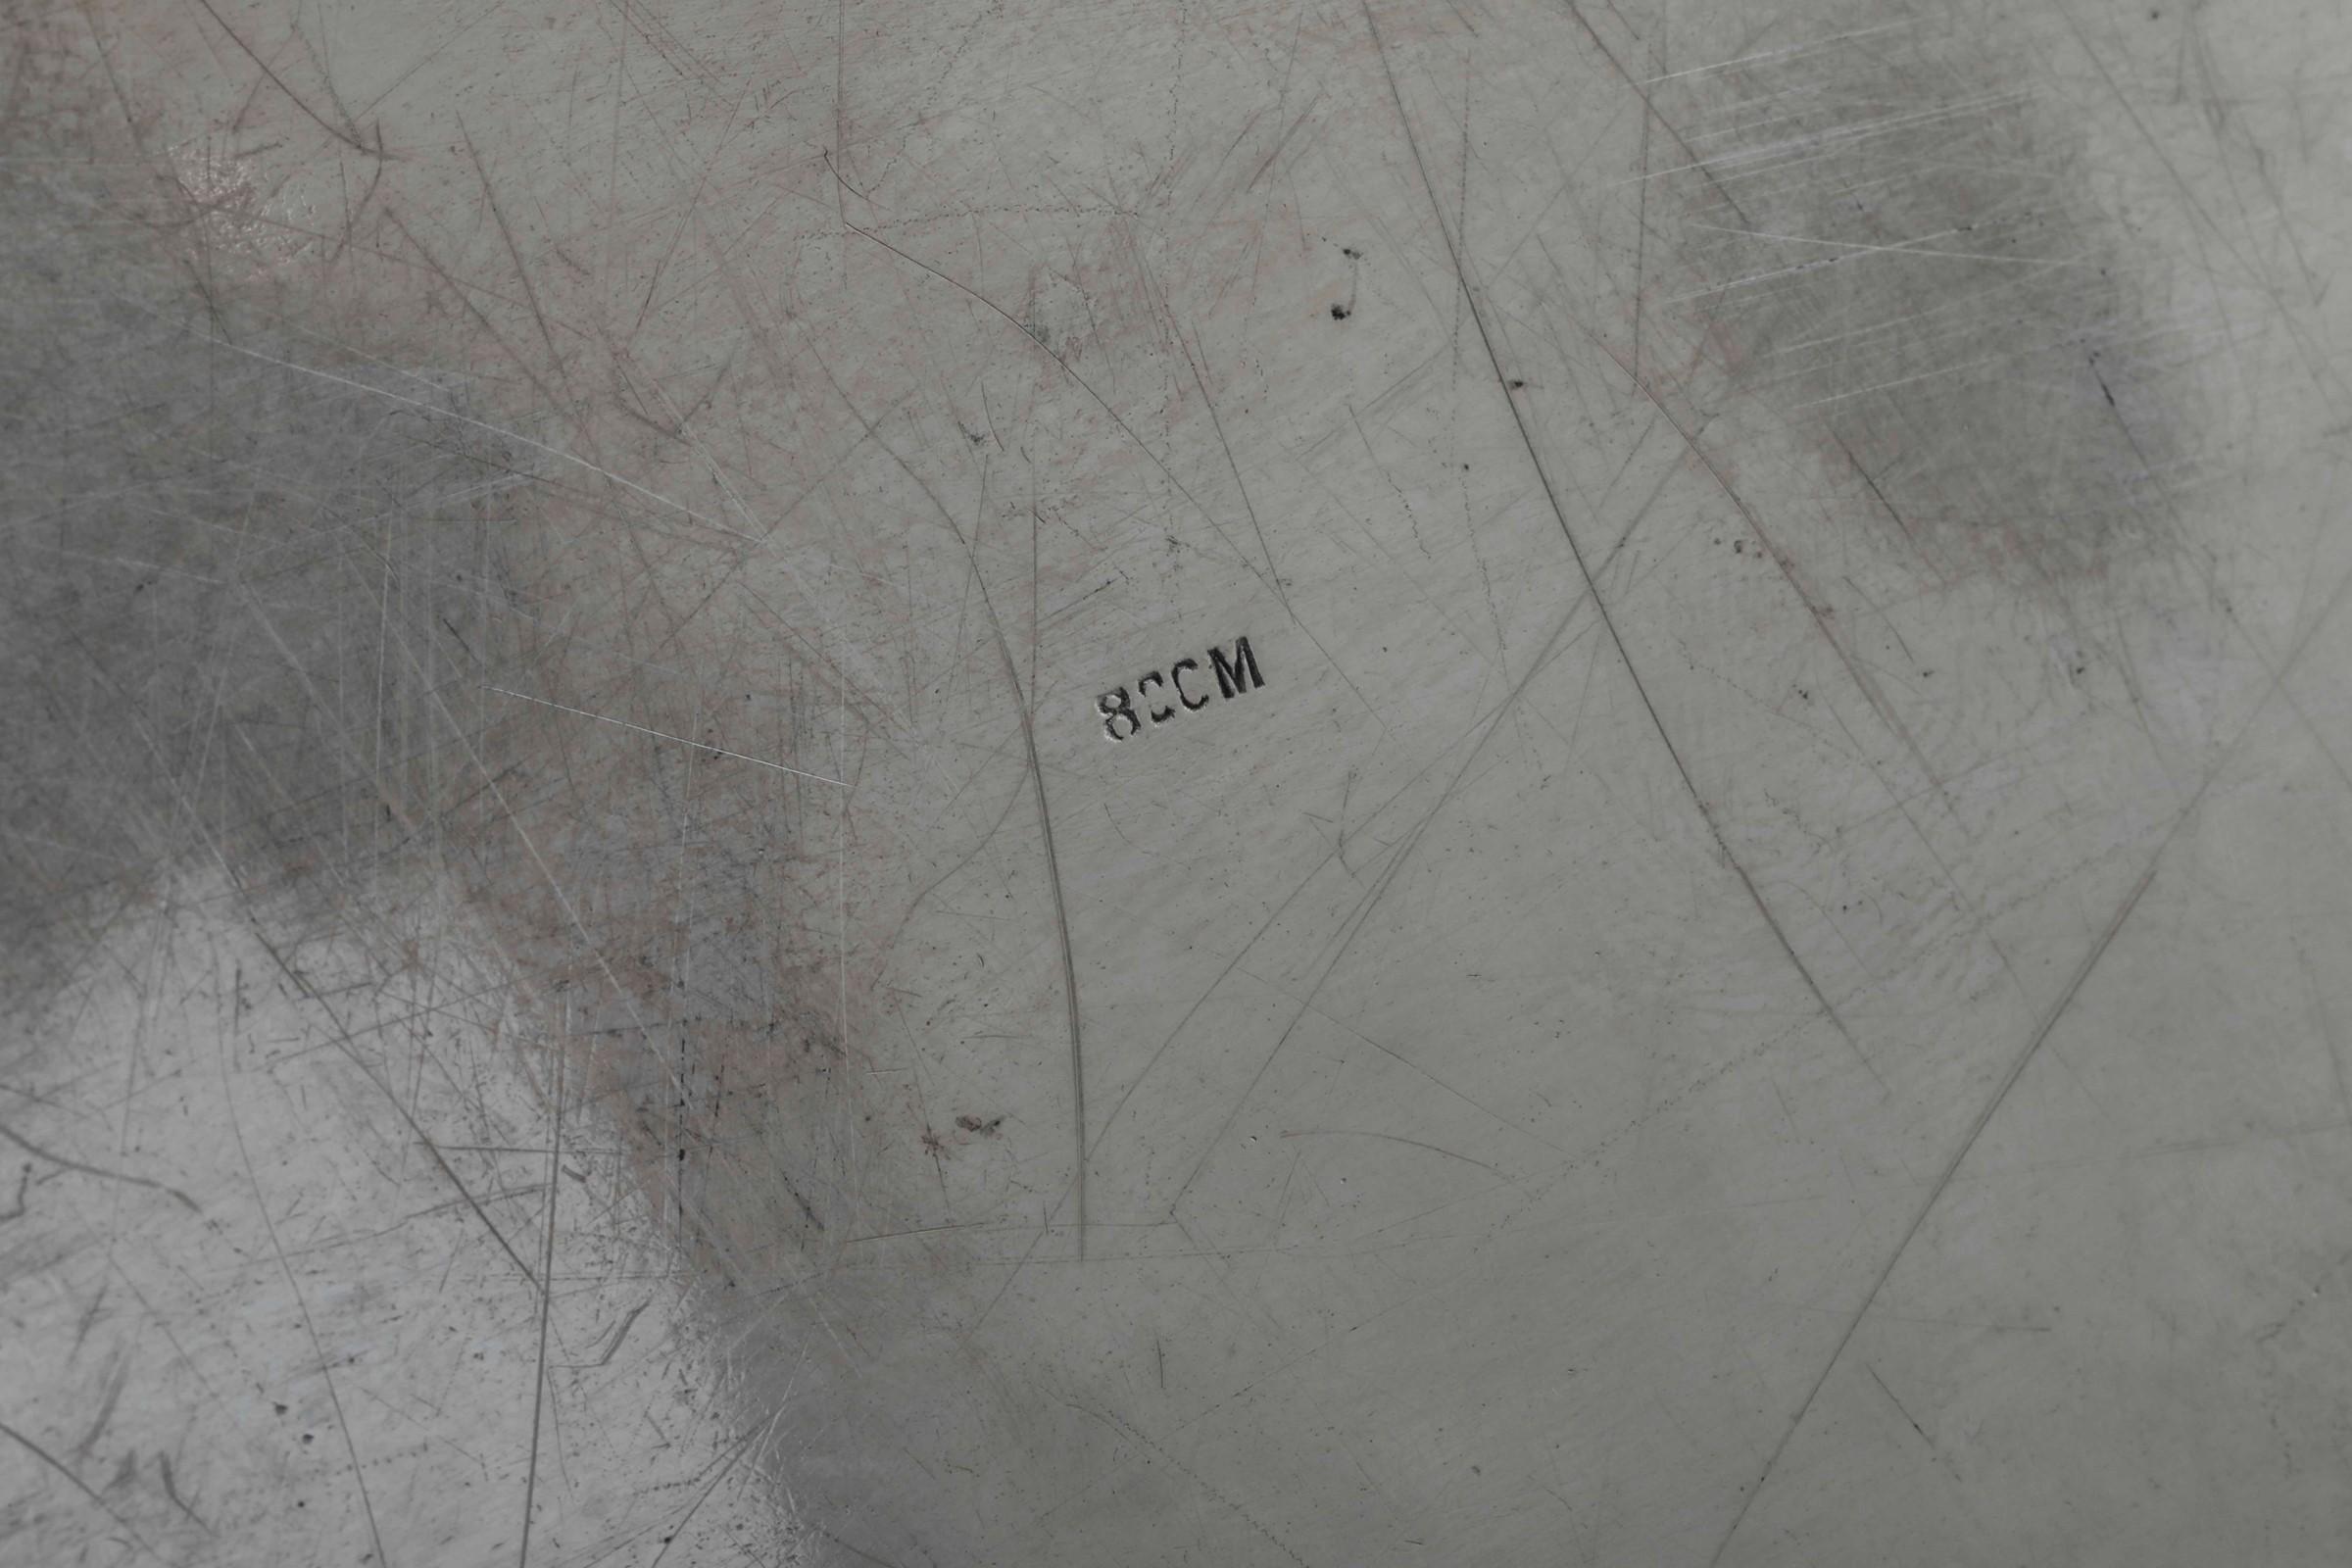 Vassoio ovale in argento inciso. Bollo di Gustav Memmert, Berlino, manifattura [...] - Image 2 of 2